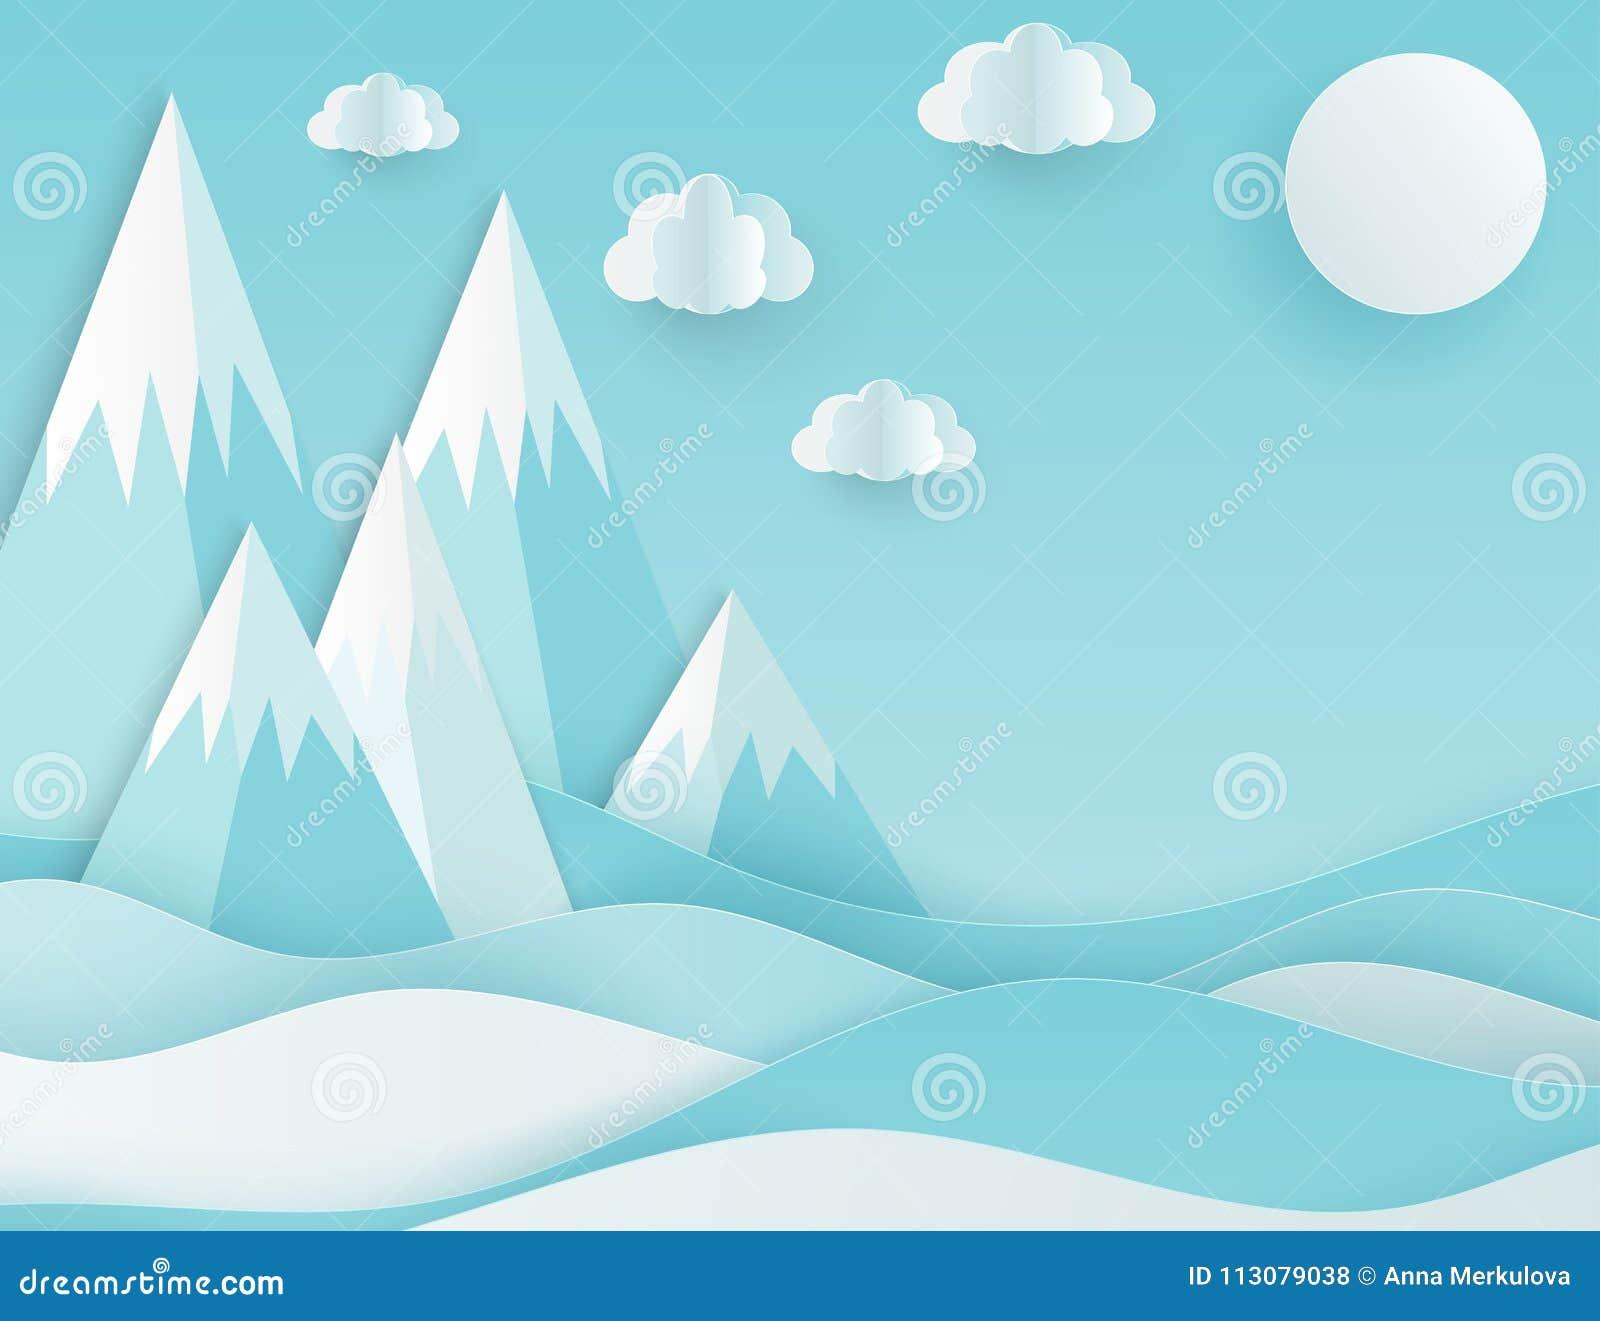 Moderne document kunstwolken en bergen Leuke beeldverhaal pluizige wolk